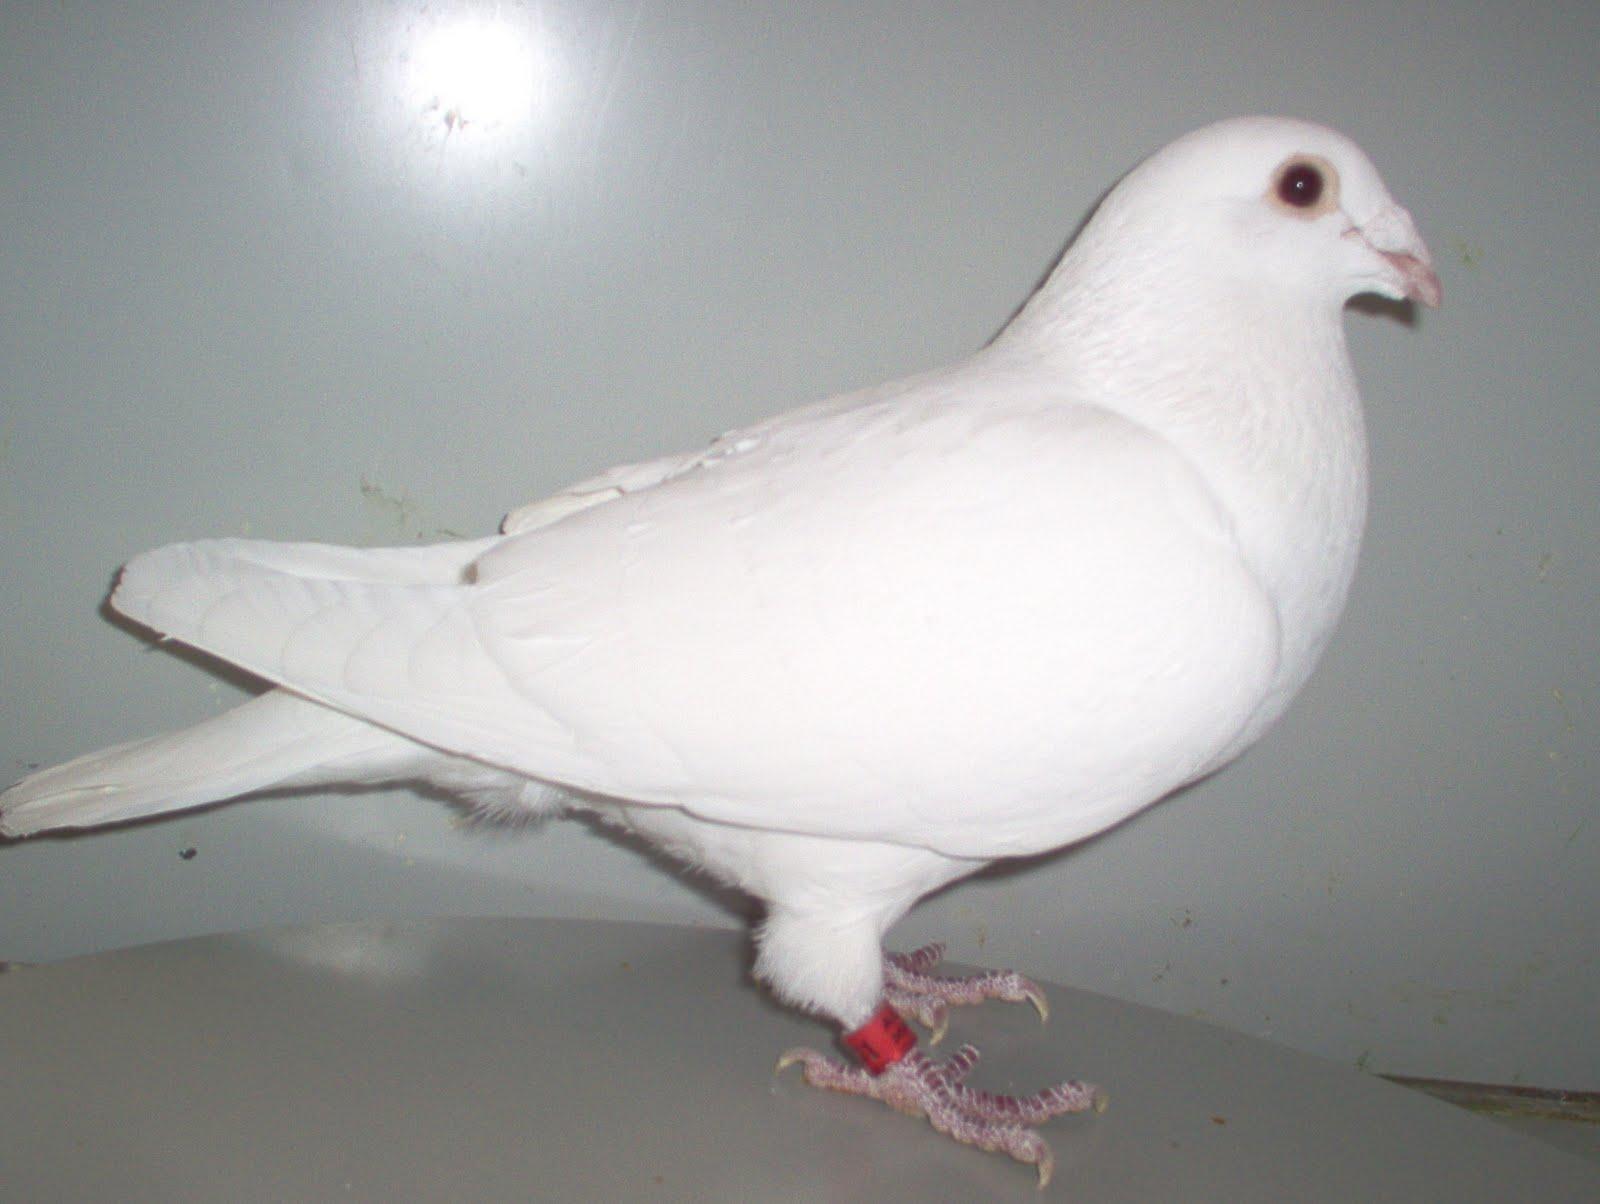 white pigeon jewish girl personals Kalamazoo baby & kid stuff - craigslist cl  (white pigeon) pic  favorite this post may 29 little girl's 12 inch bike $12.